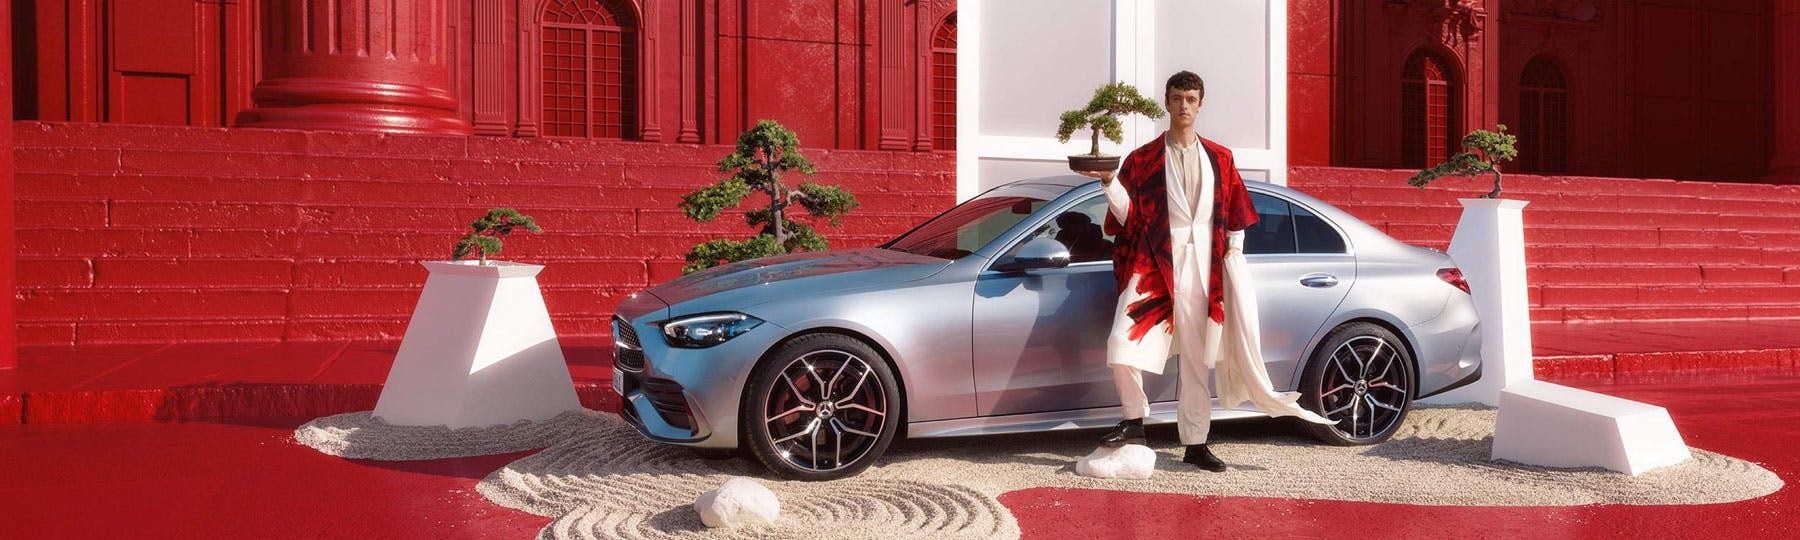 New Mercedes-Benz C-Class Saloon